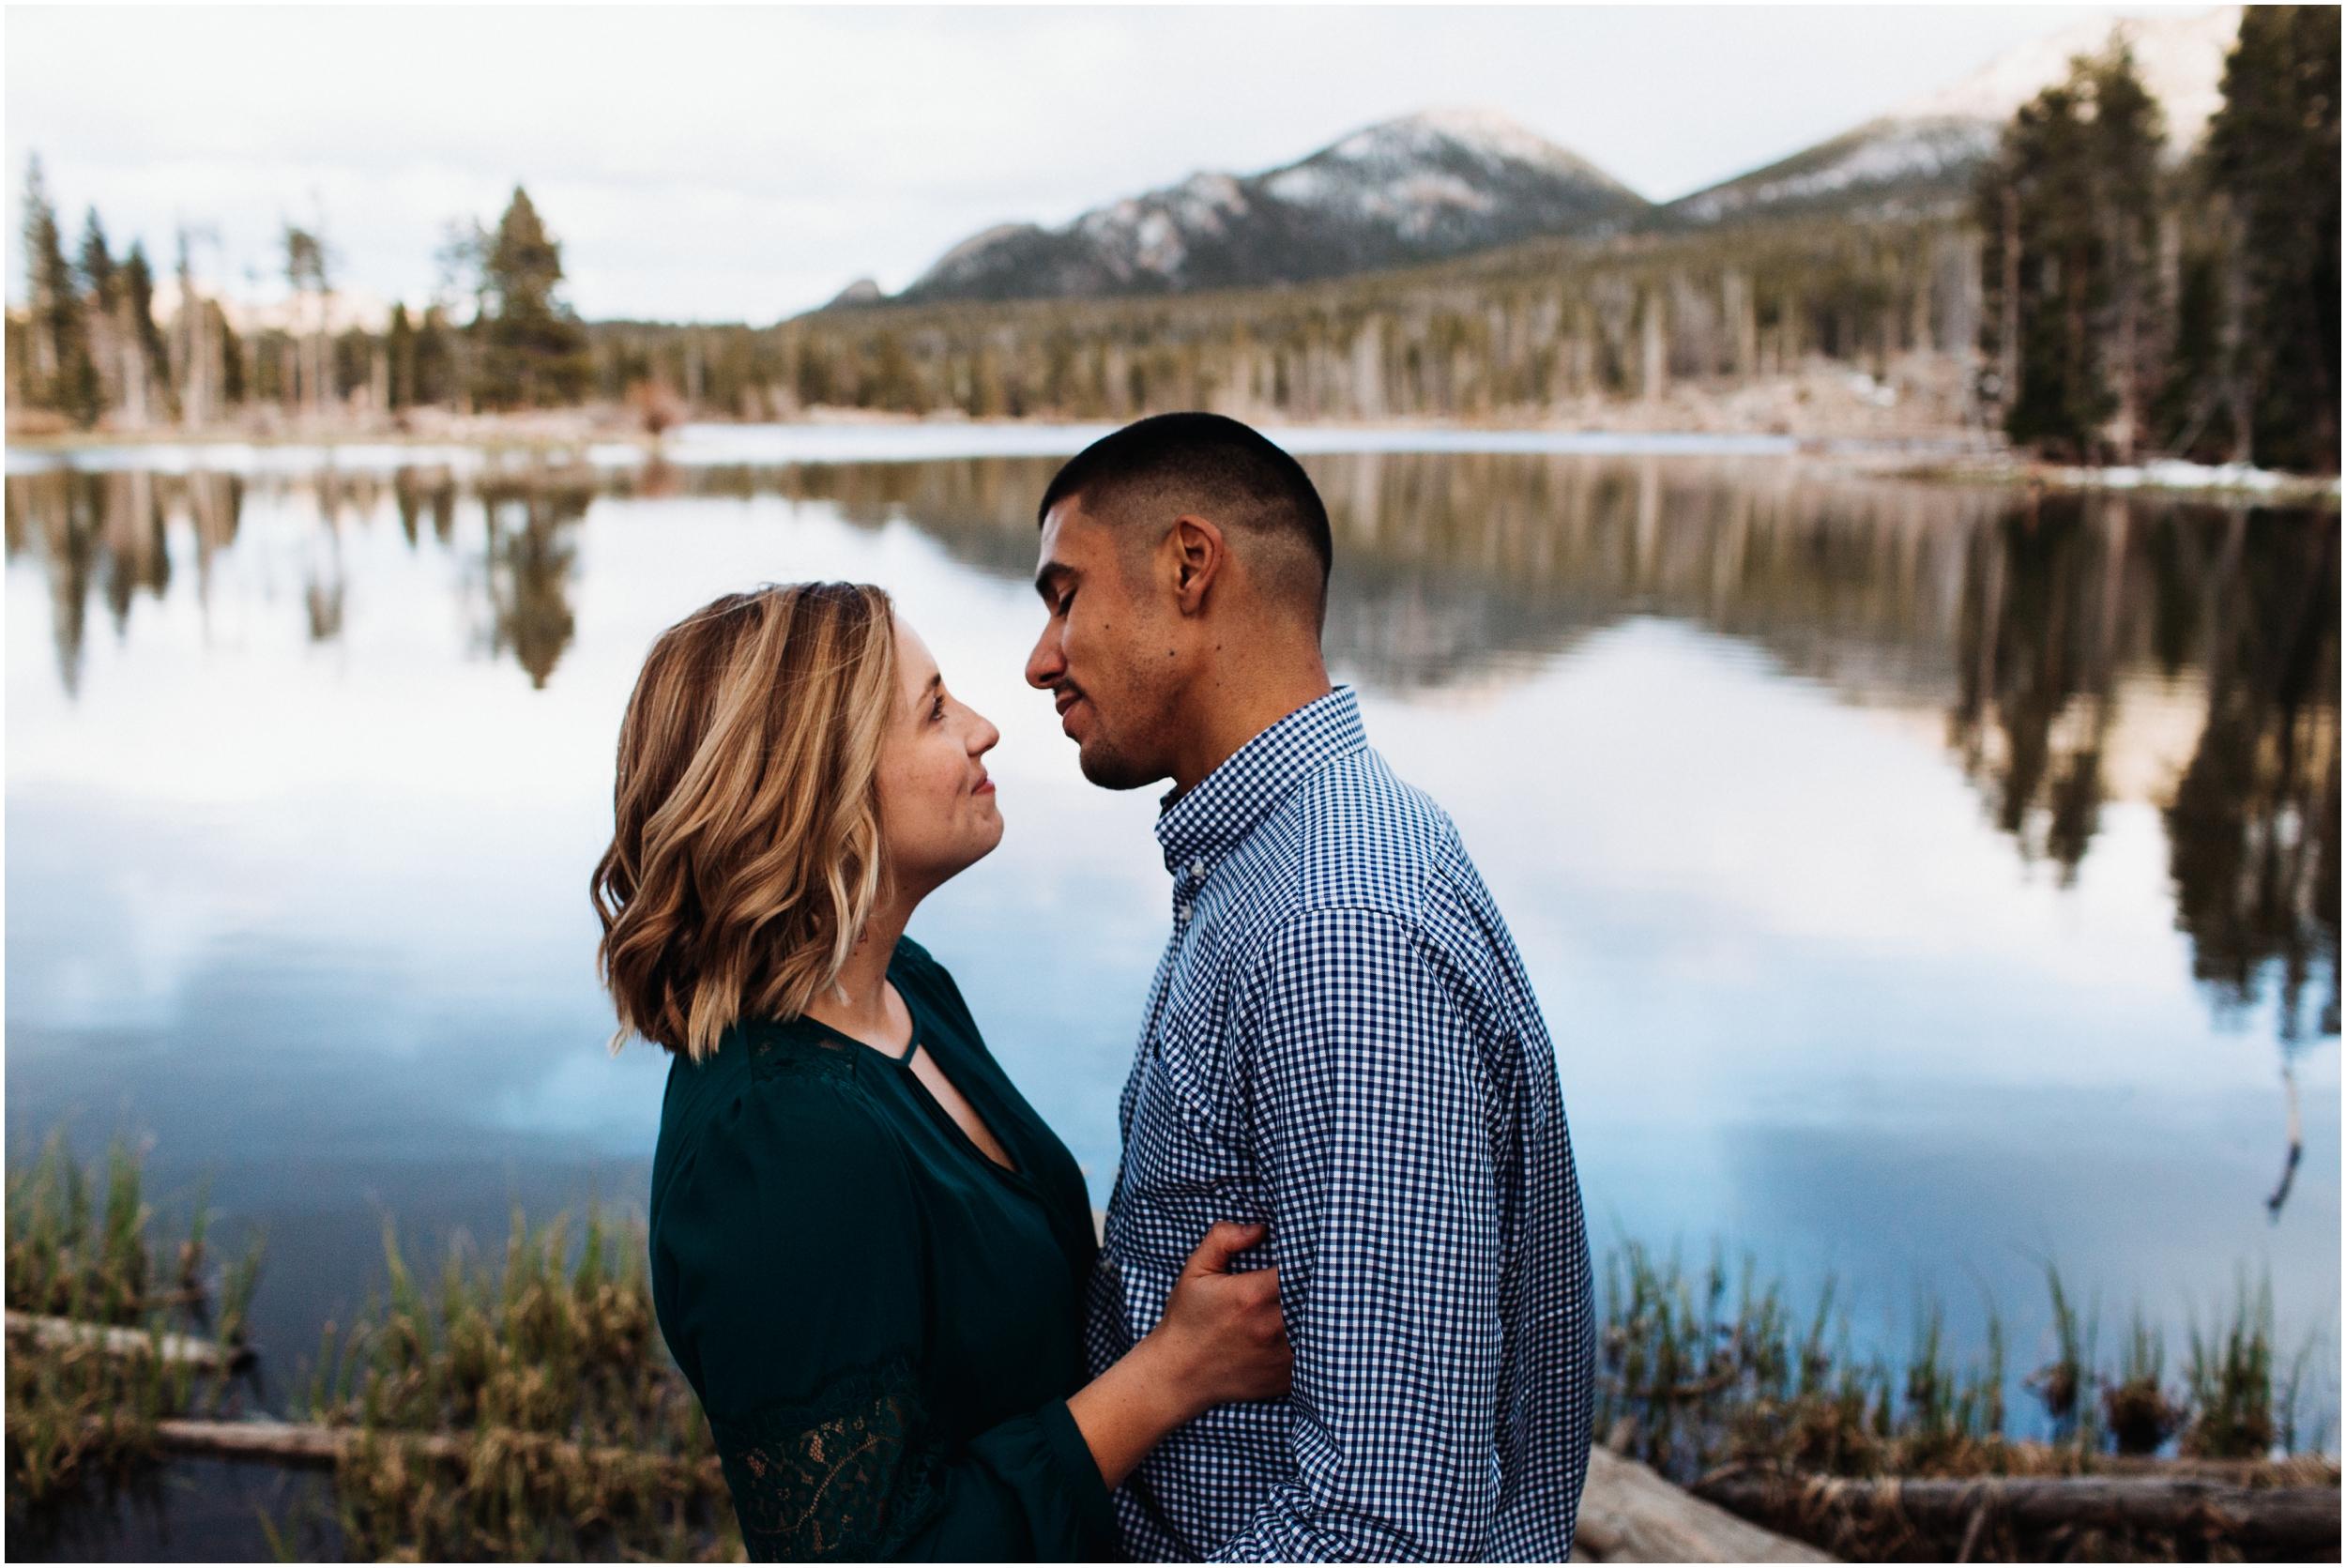 rocky-mountain-national-park-elopement-sprague-lake-colorado-adventure-wedding-photographer_taylor-powers_157.jpg